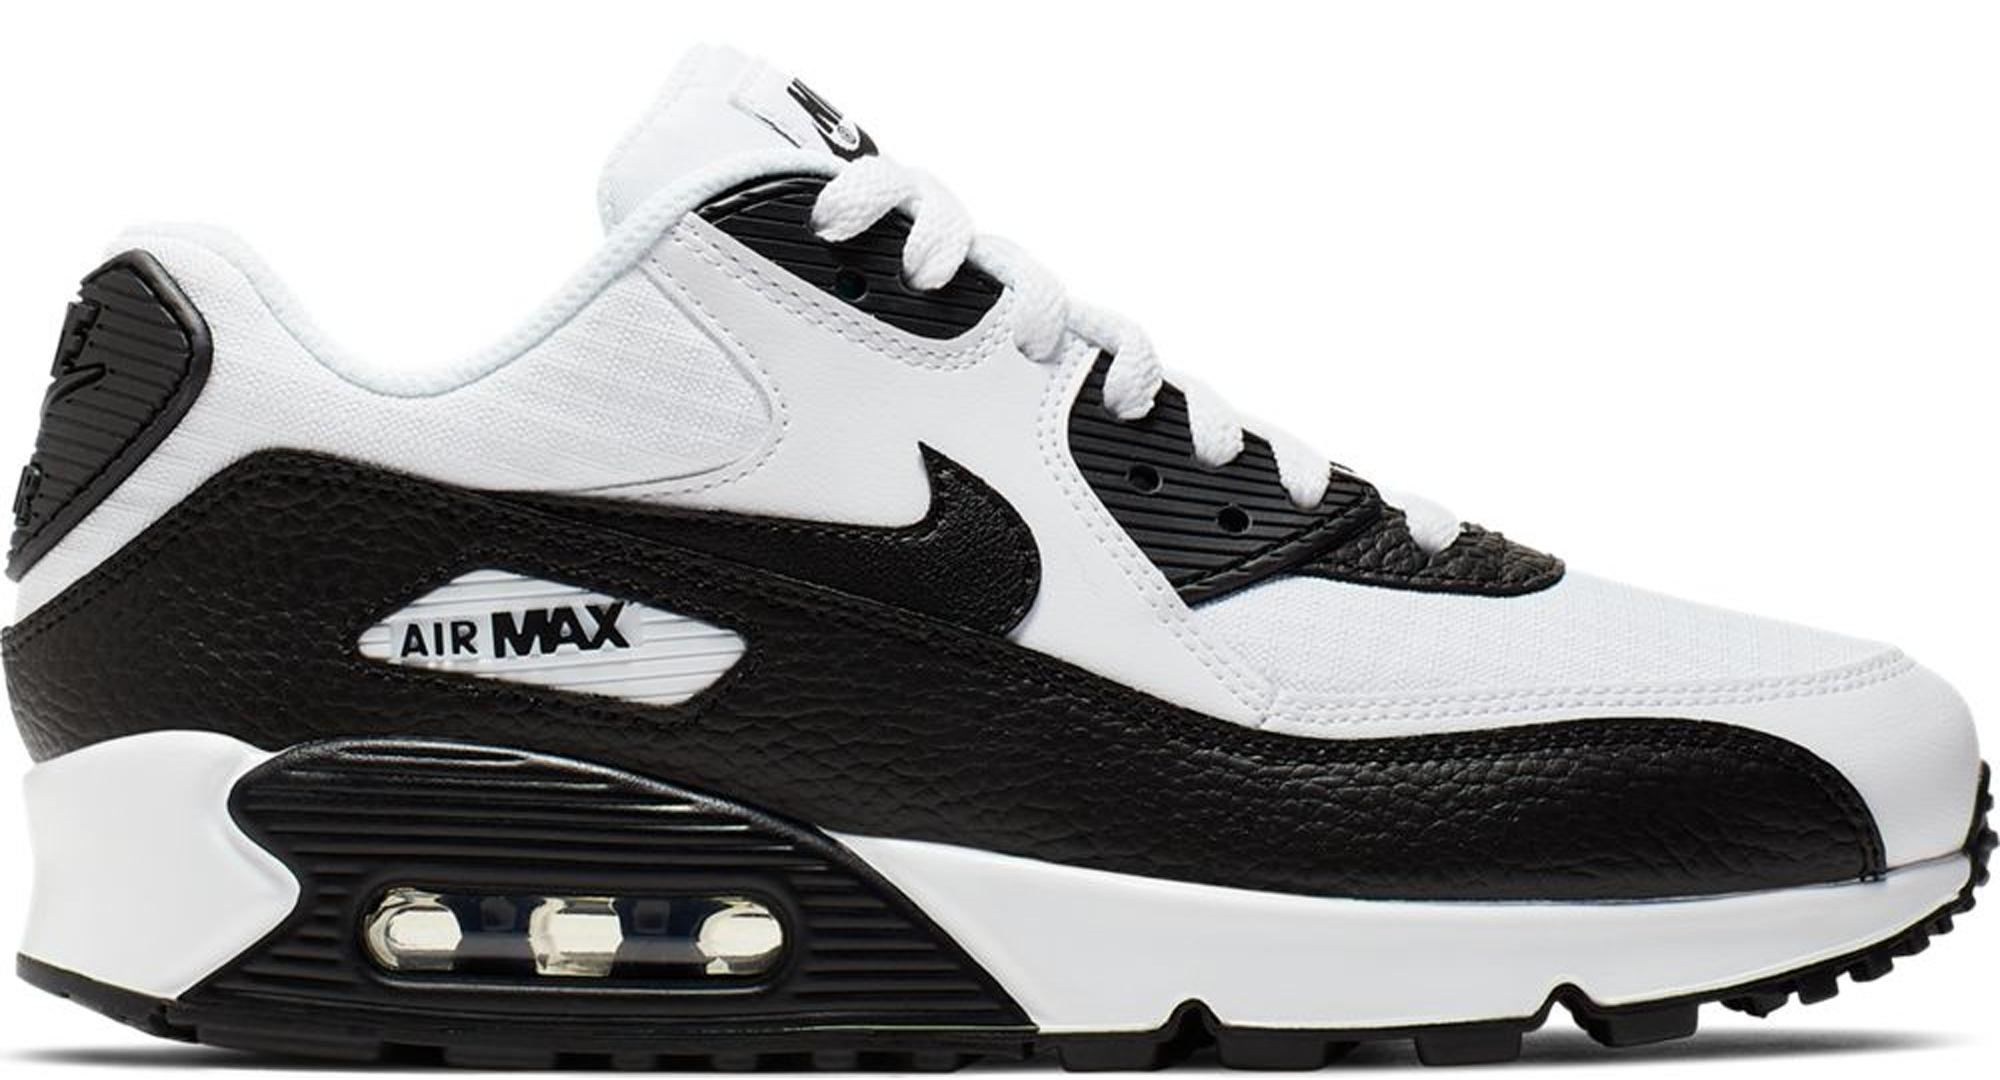 Nike Air Max 90 White Black (2019